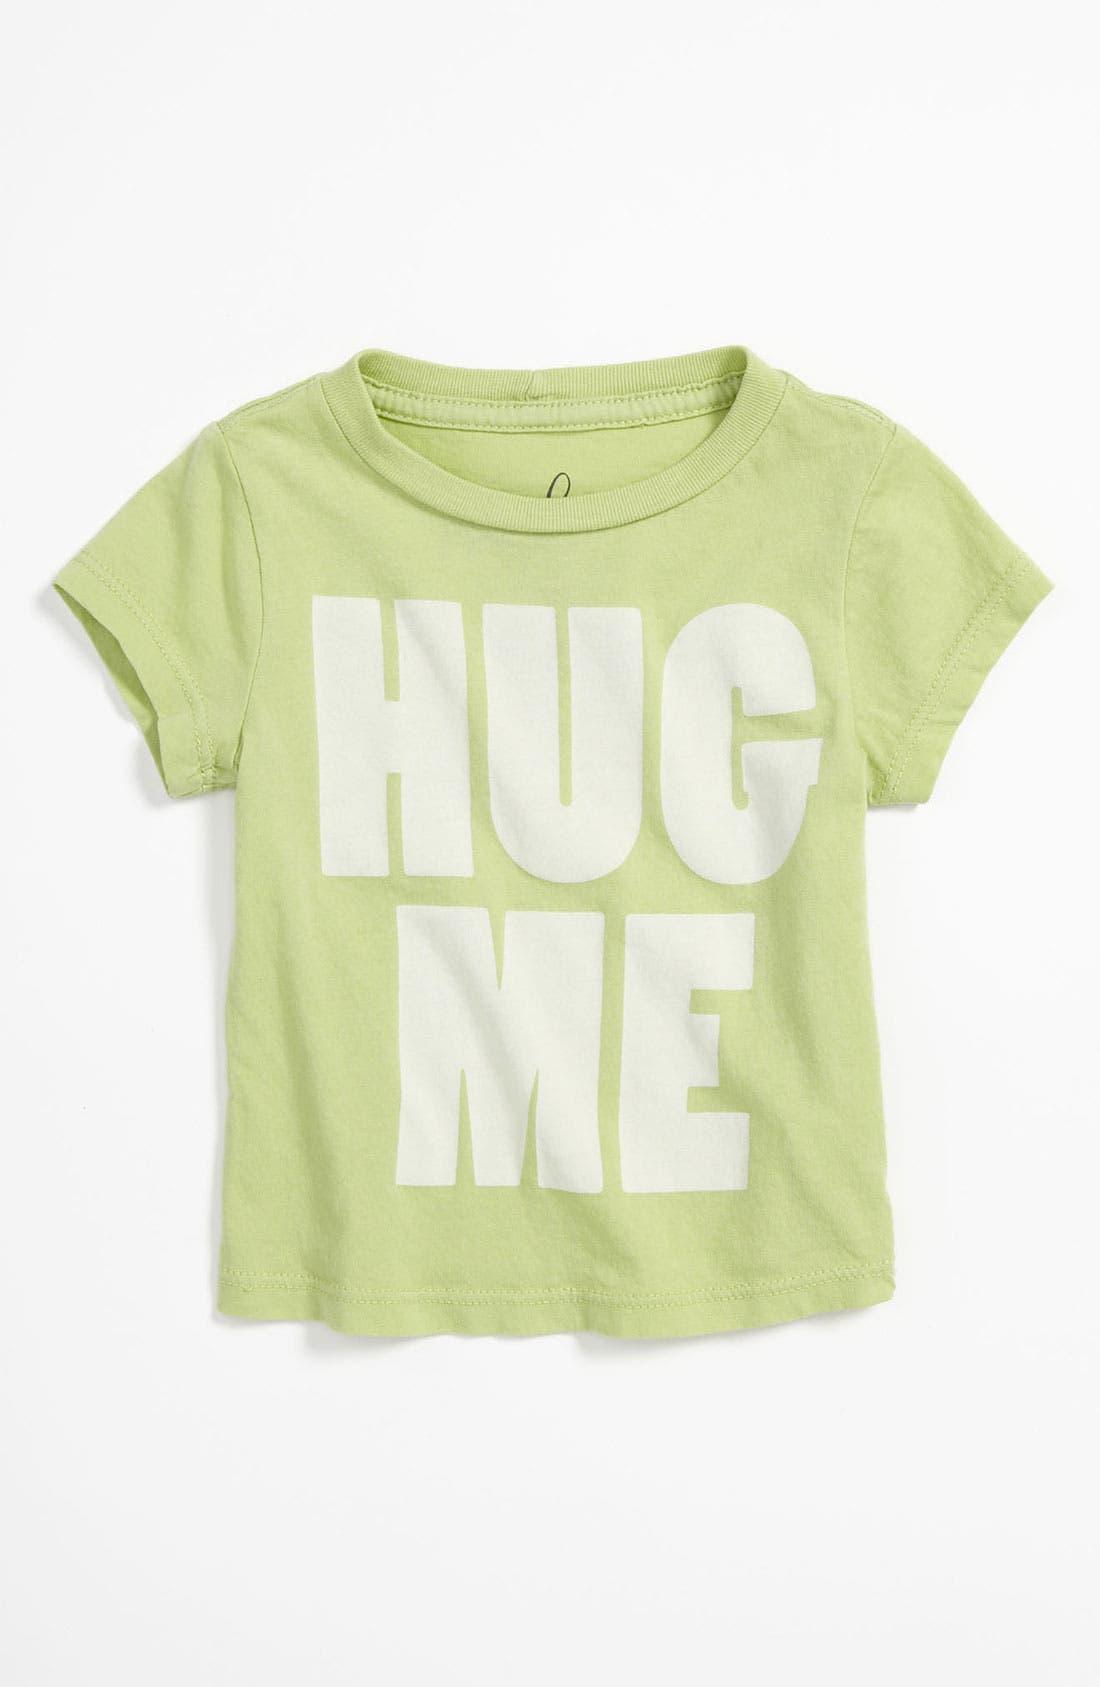 Main Image - Peek 'Little Peanut - Hug Me' T-Shirt (Baby)